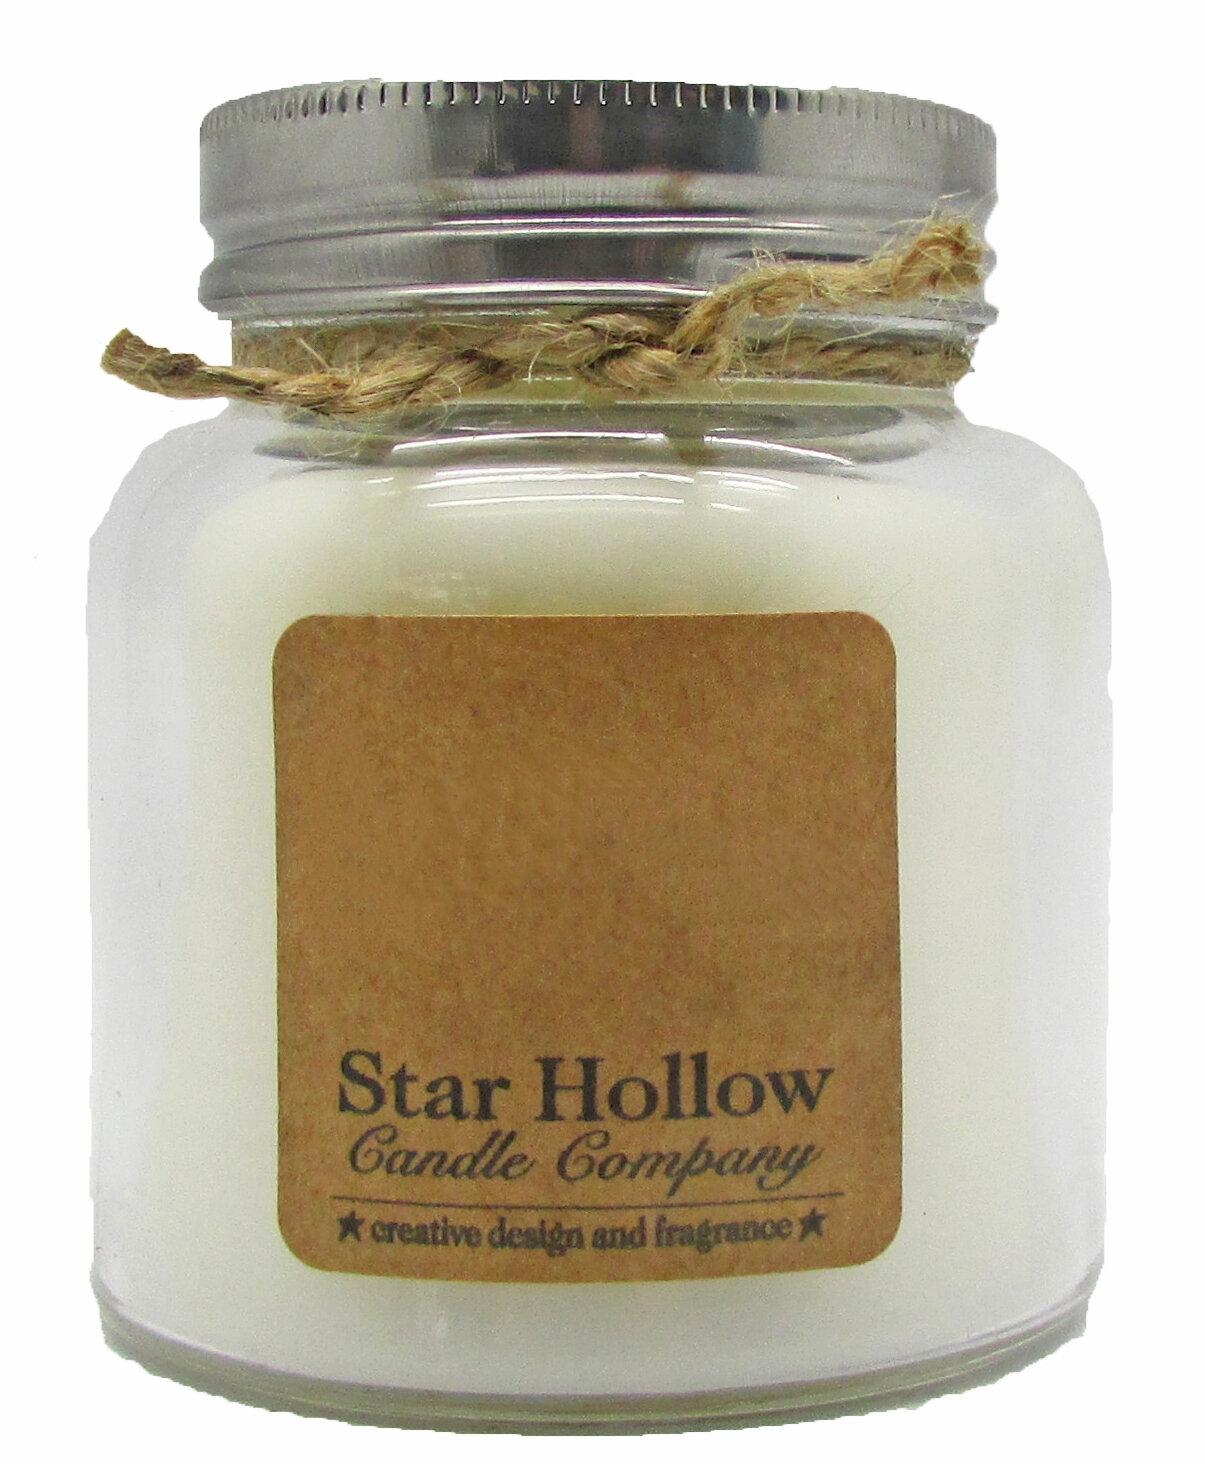 Starhollowcandleco Ooey Gooey Fudge Cake Scented Jar Candle Wayfair